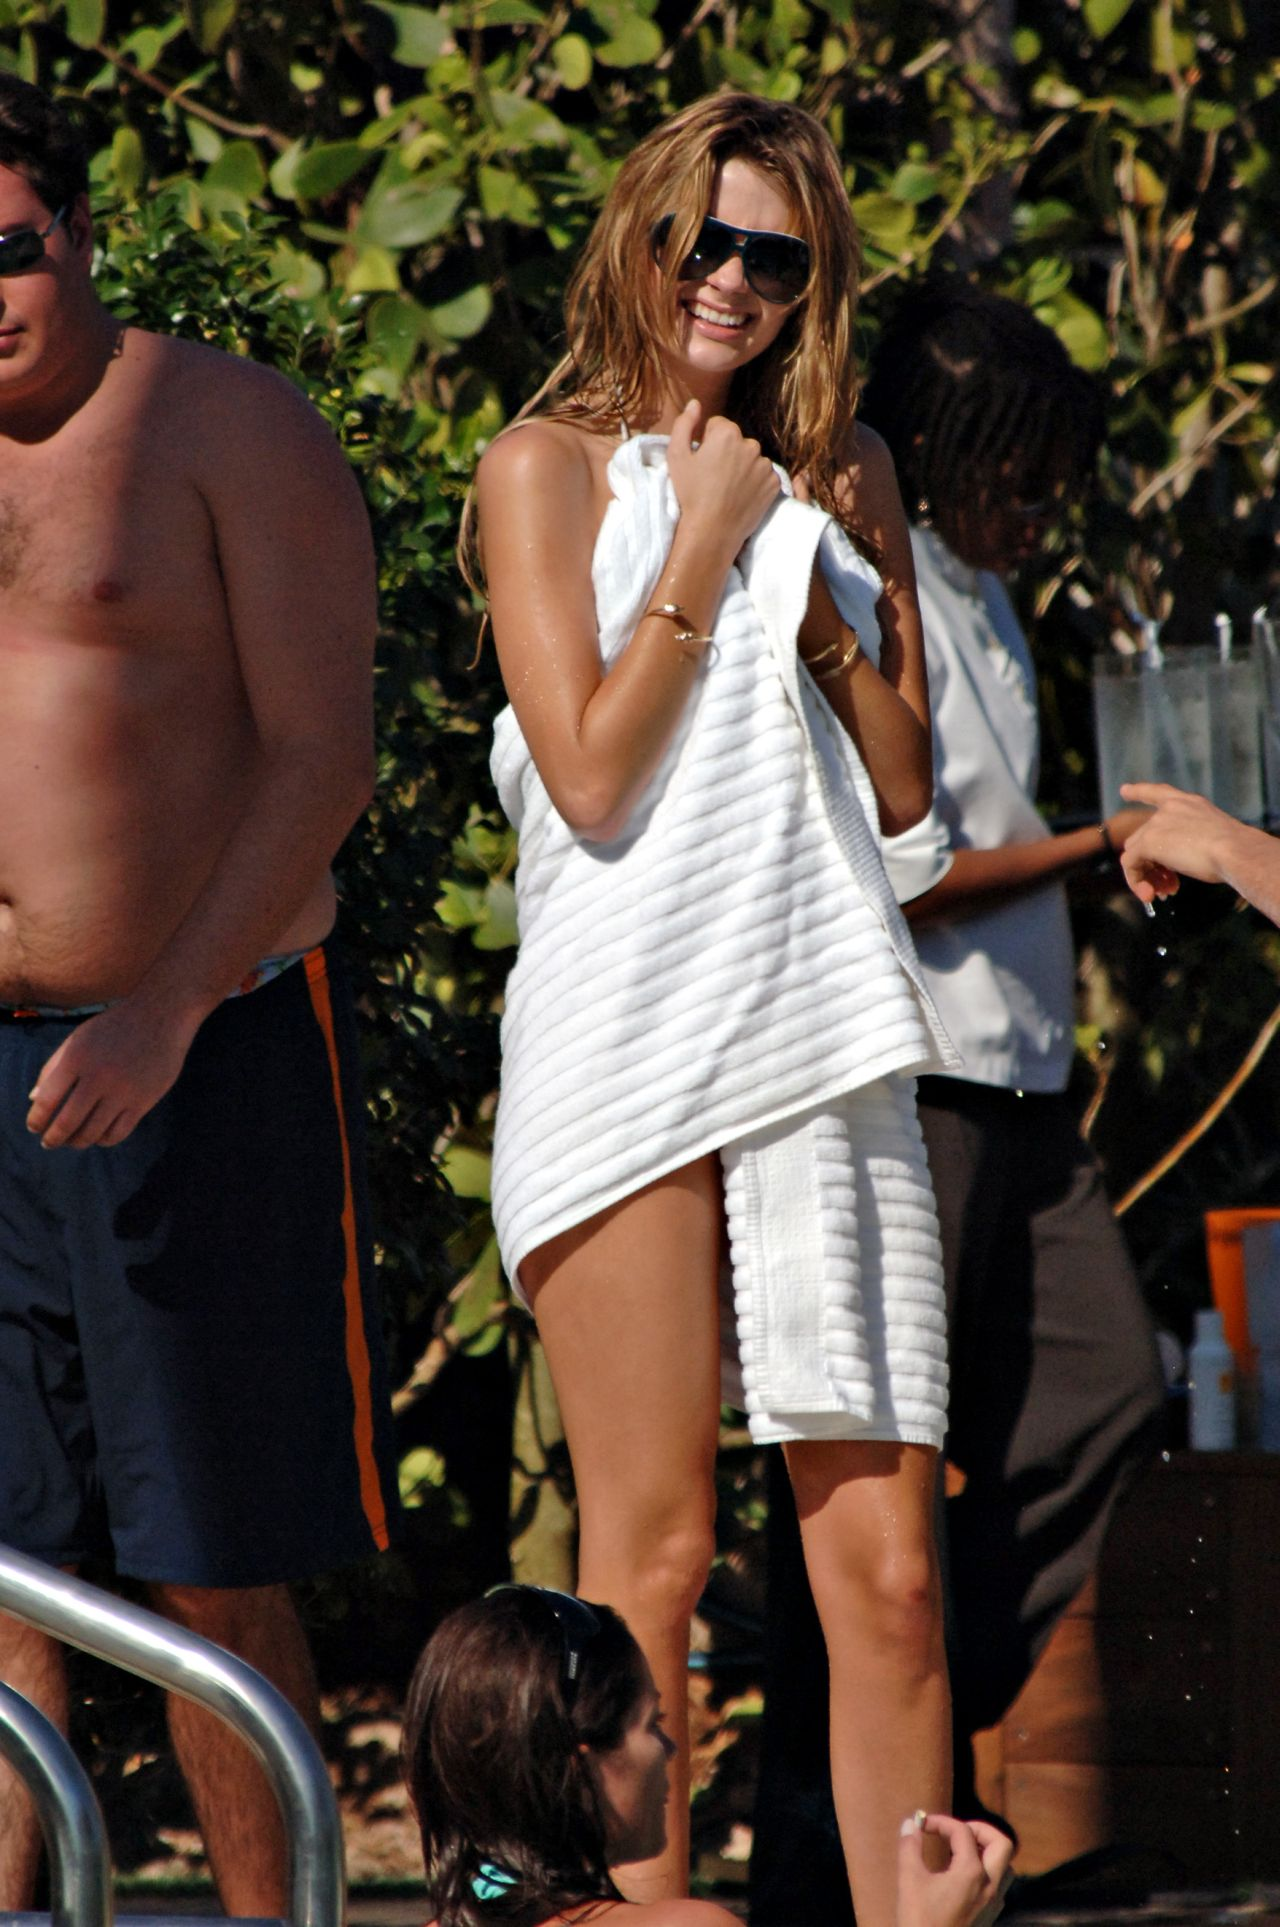 12802_Mischa_Barton_pool_bikini_candids0001_122_981lo.jpg